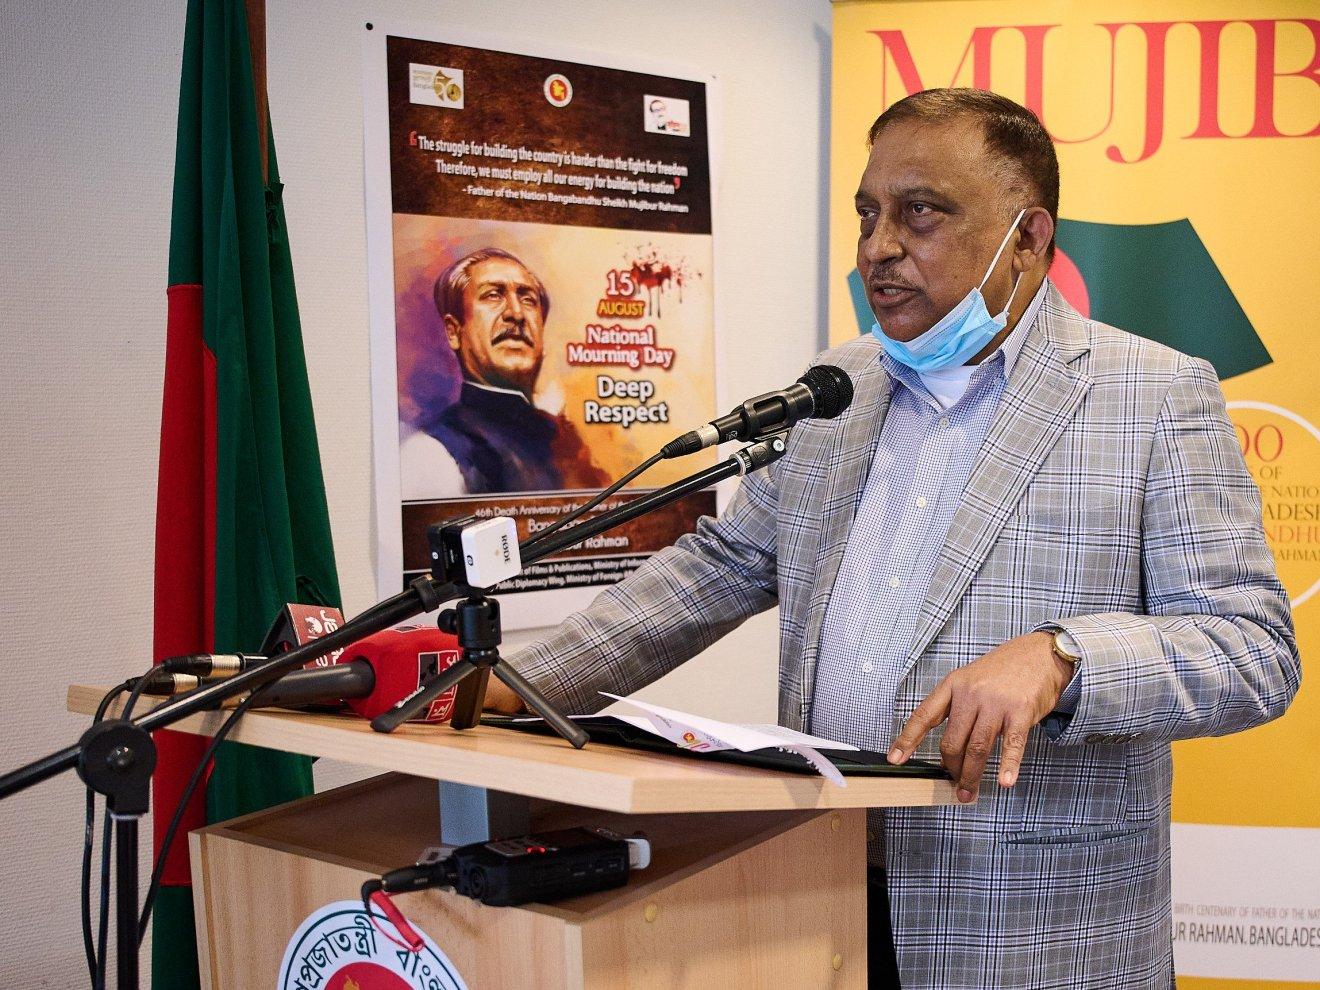 Bangladesh establishes ePassport infrastructure in all embassies